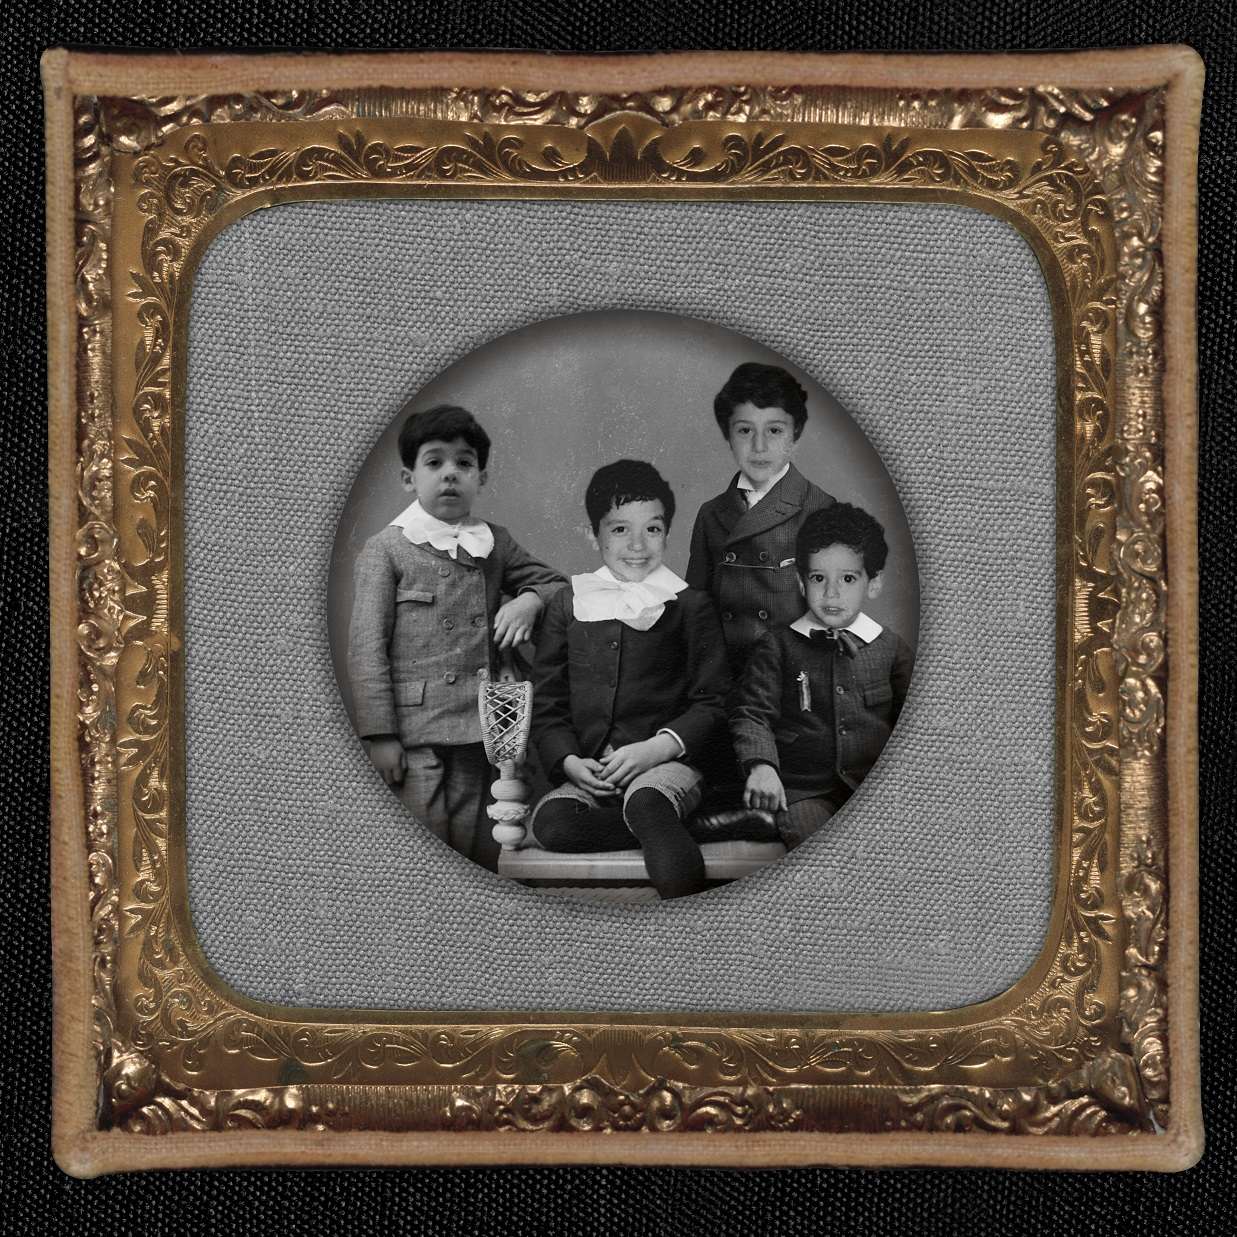 Mashrou' Leila/THE BEIRUT SCHOOL LP